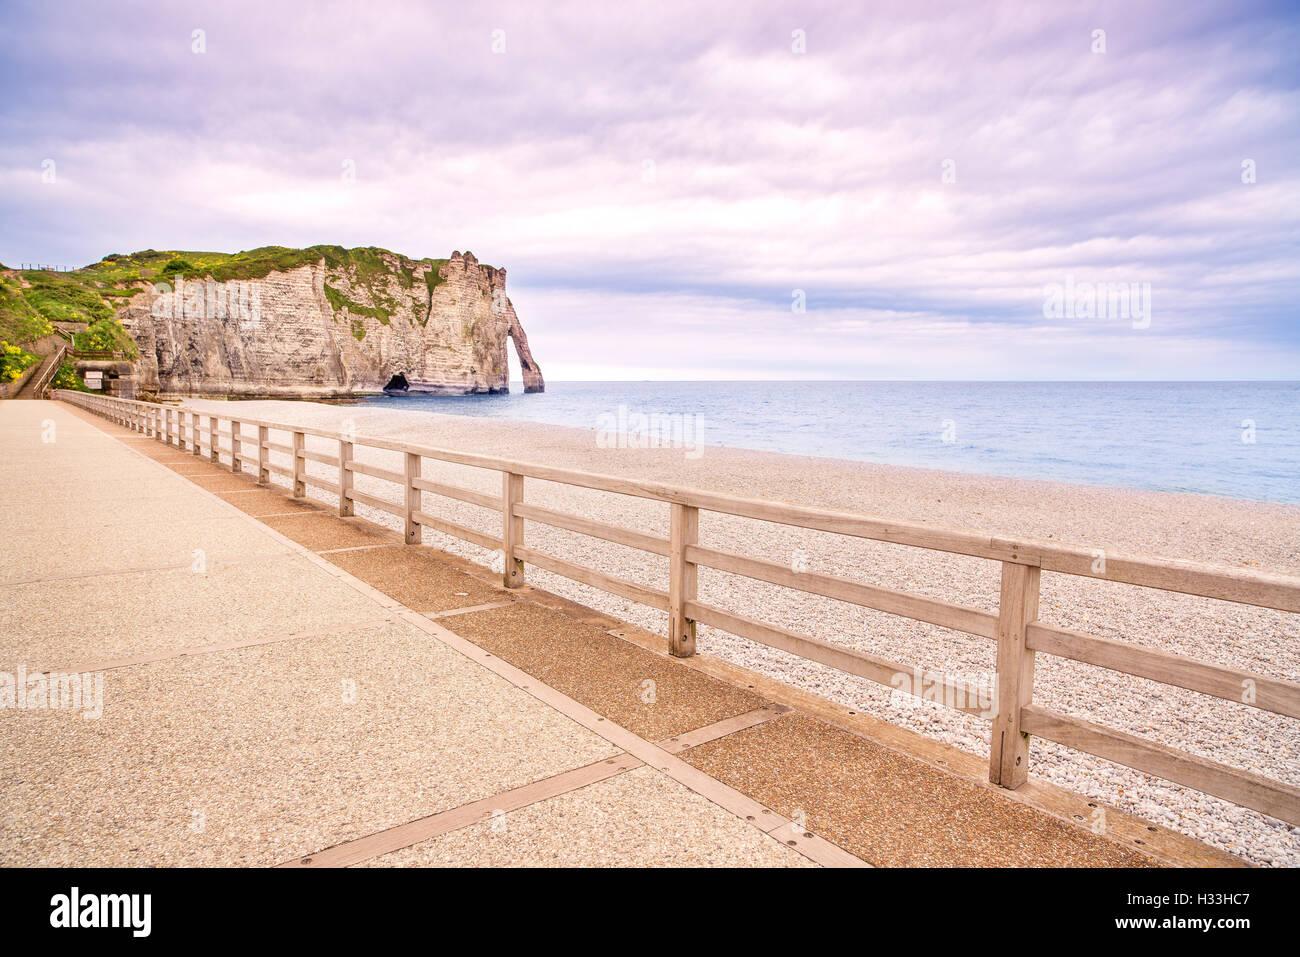 Etretat Aval cliff landmark, balcony and beach under a cloudy sky. Normandy, France, Europe. - Stock Image